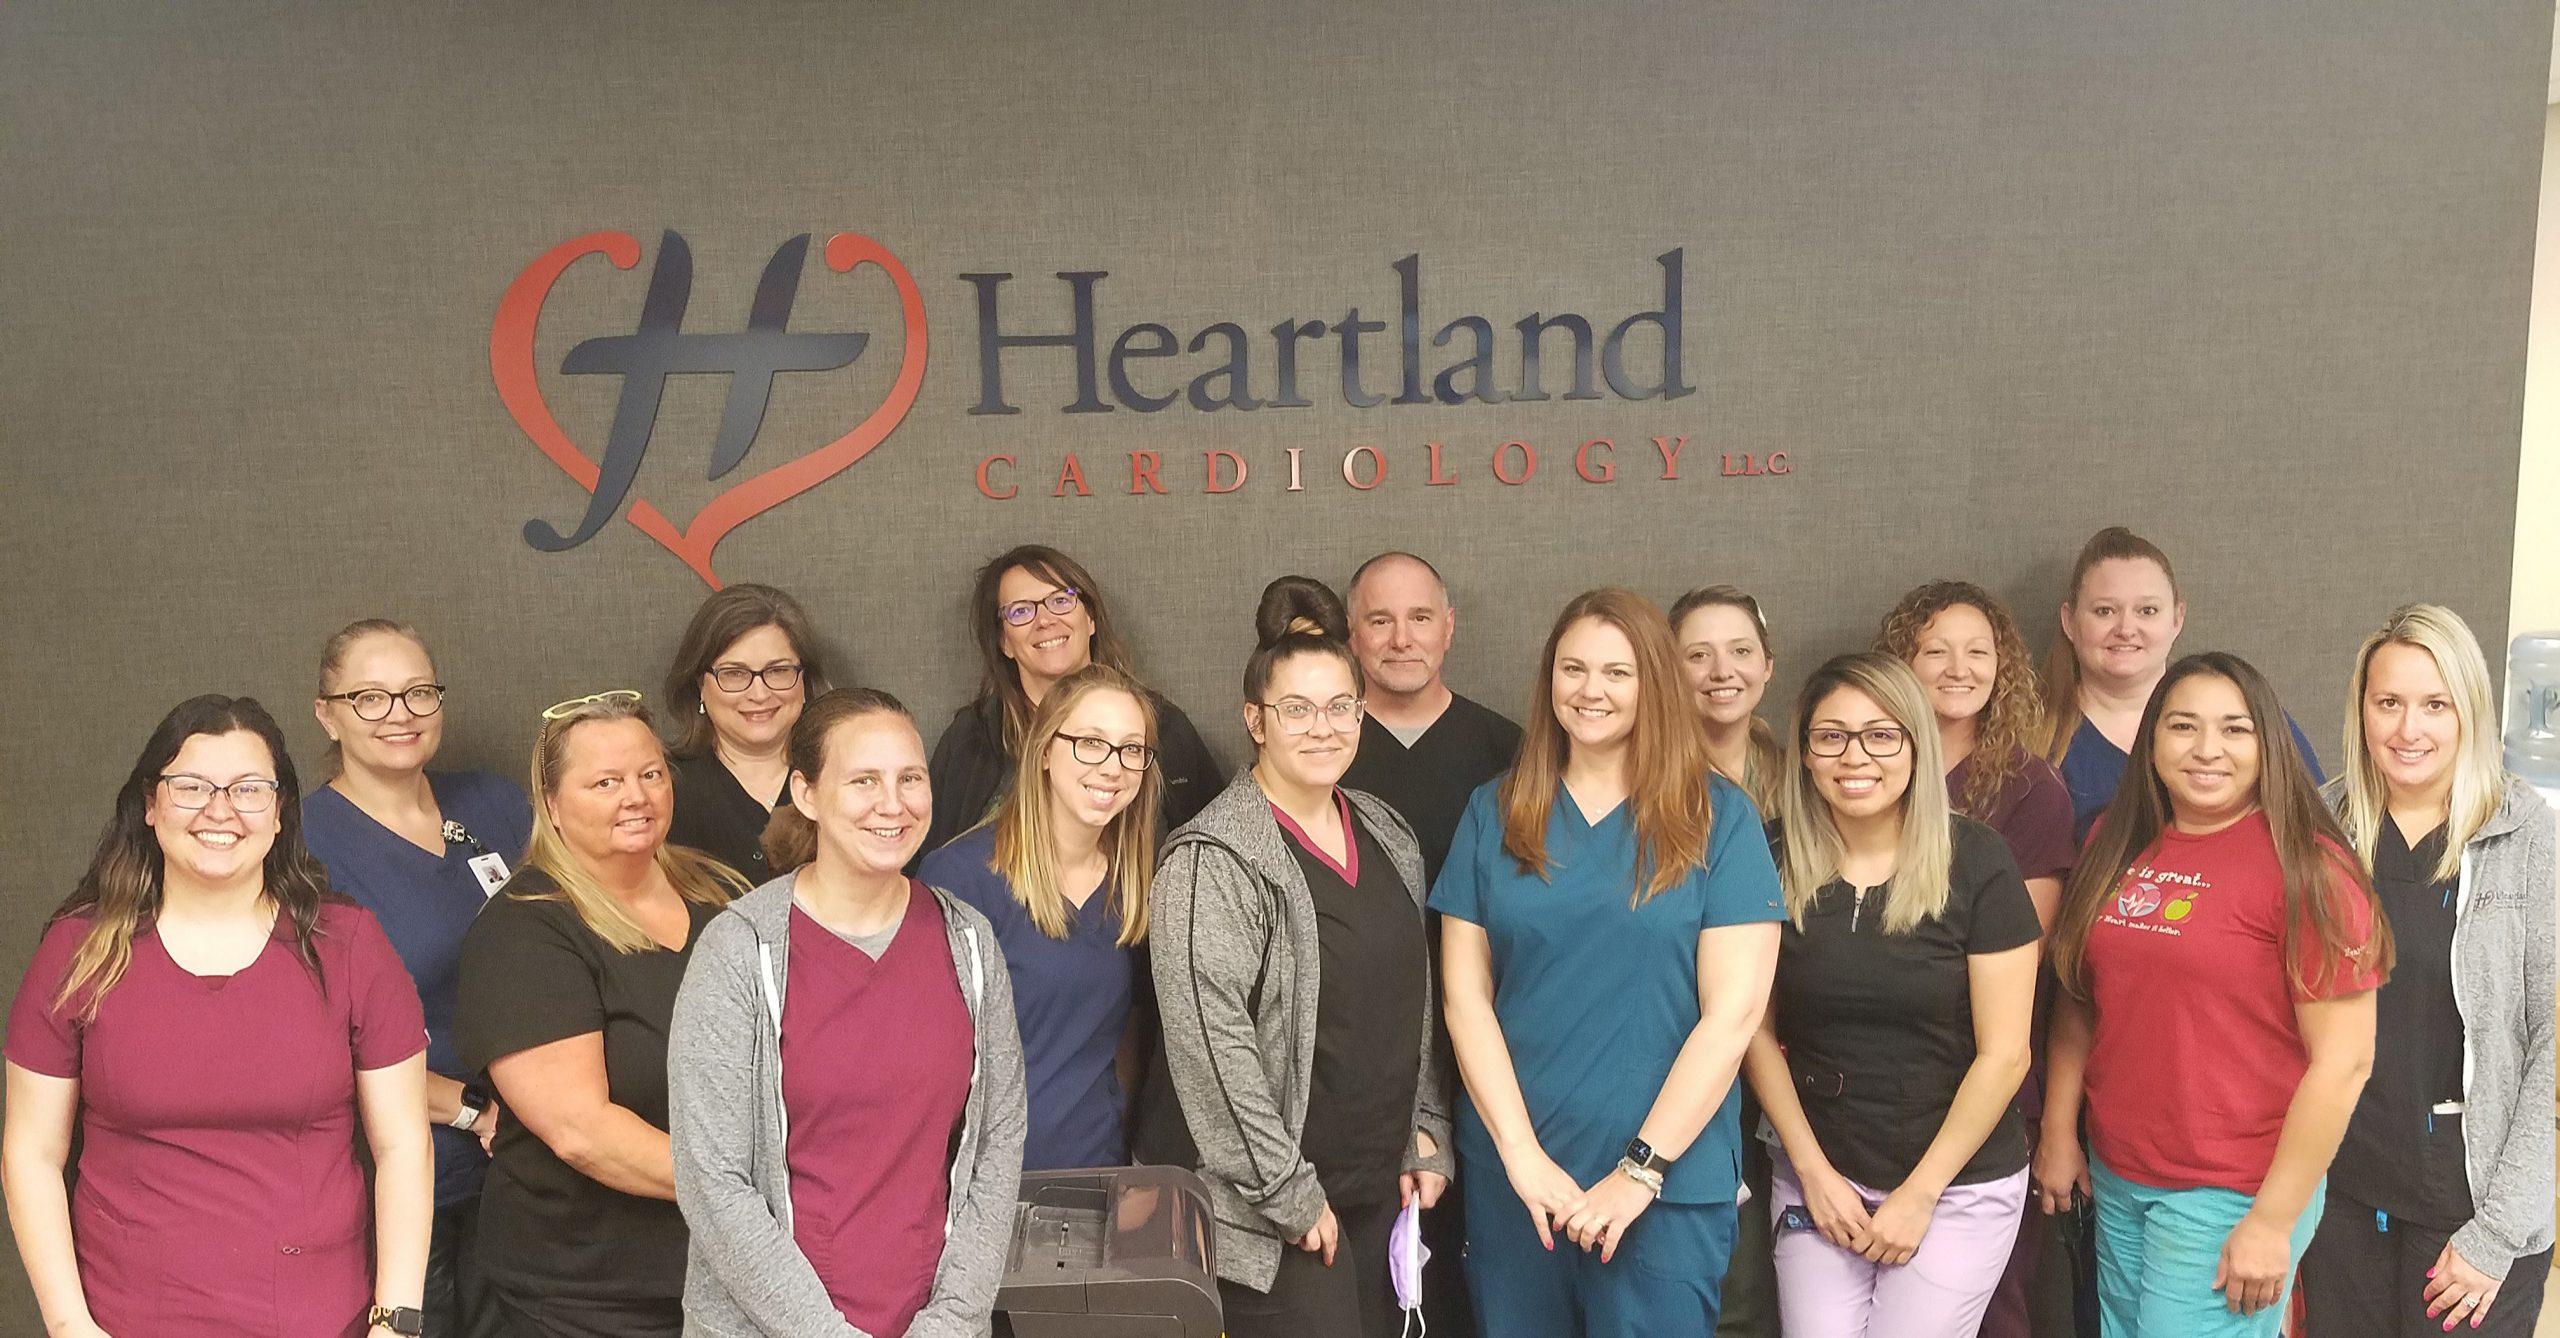 Heartland Cardiology is Celebrating Nurses Day